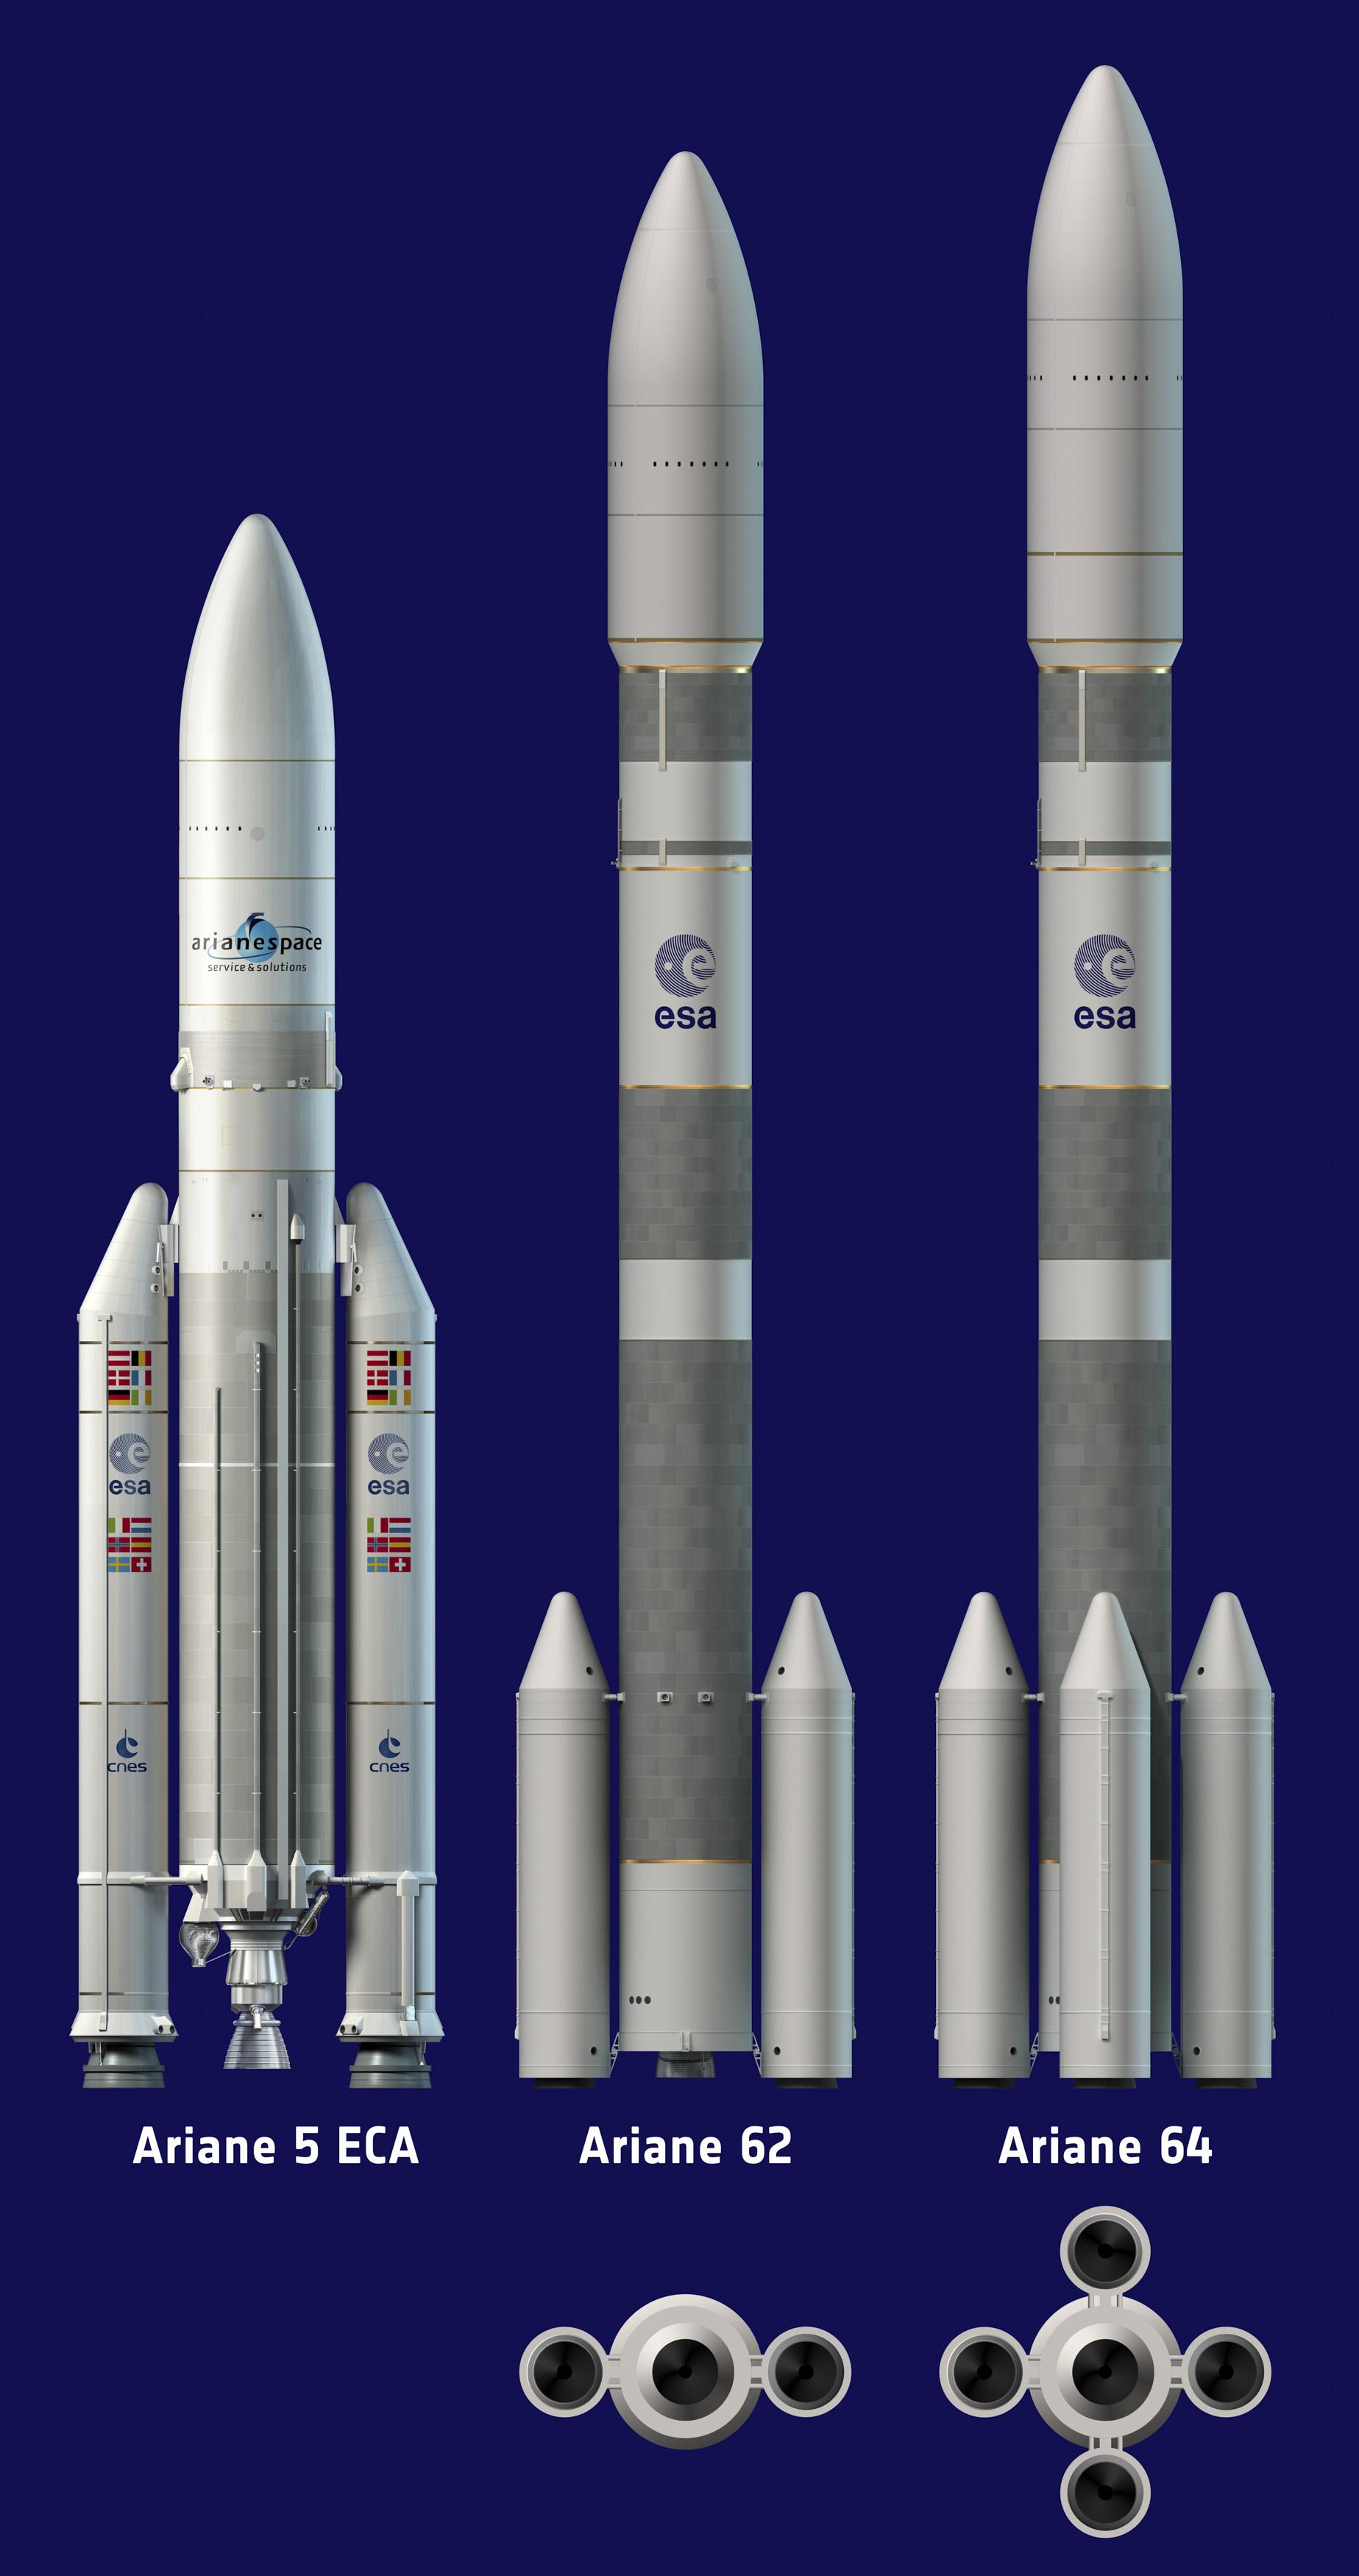 A comparison of the Ariane 5, Ariane 62 and Ariane 64 rockets. Credit: ESA–D. Ducros, 2014